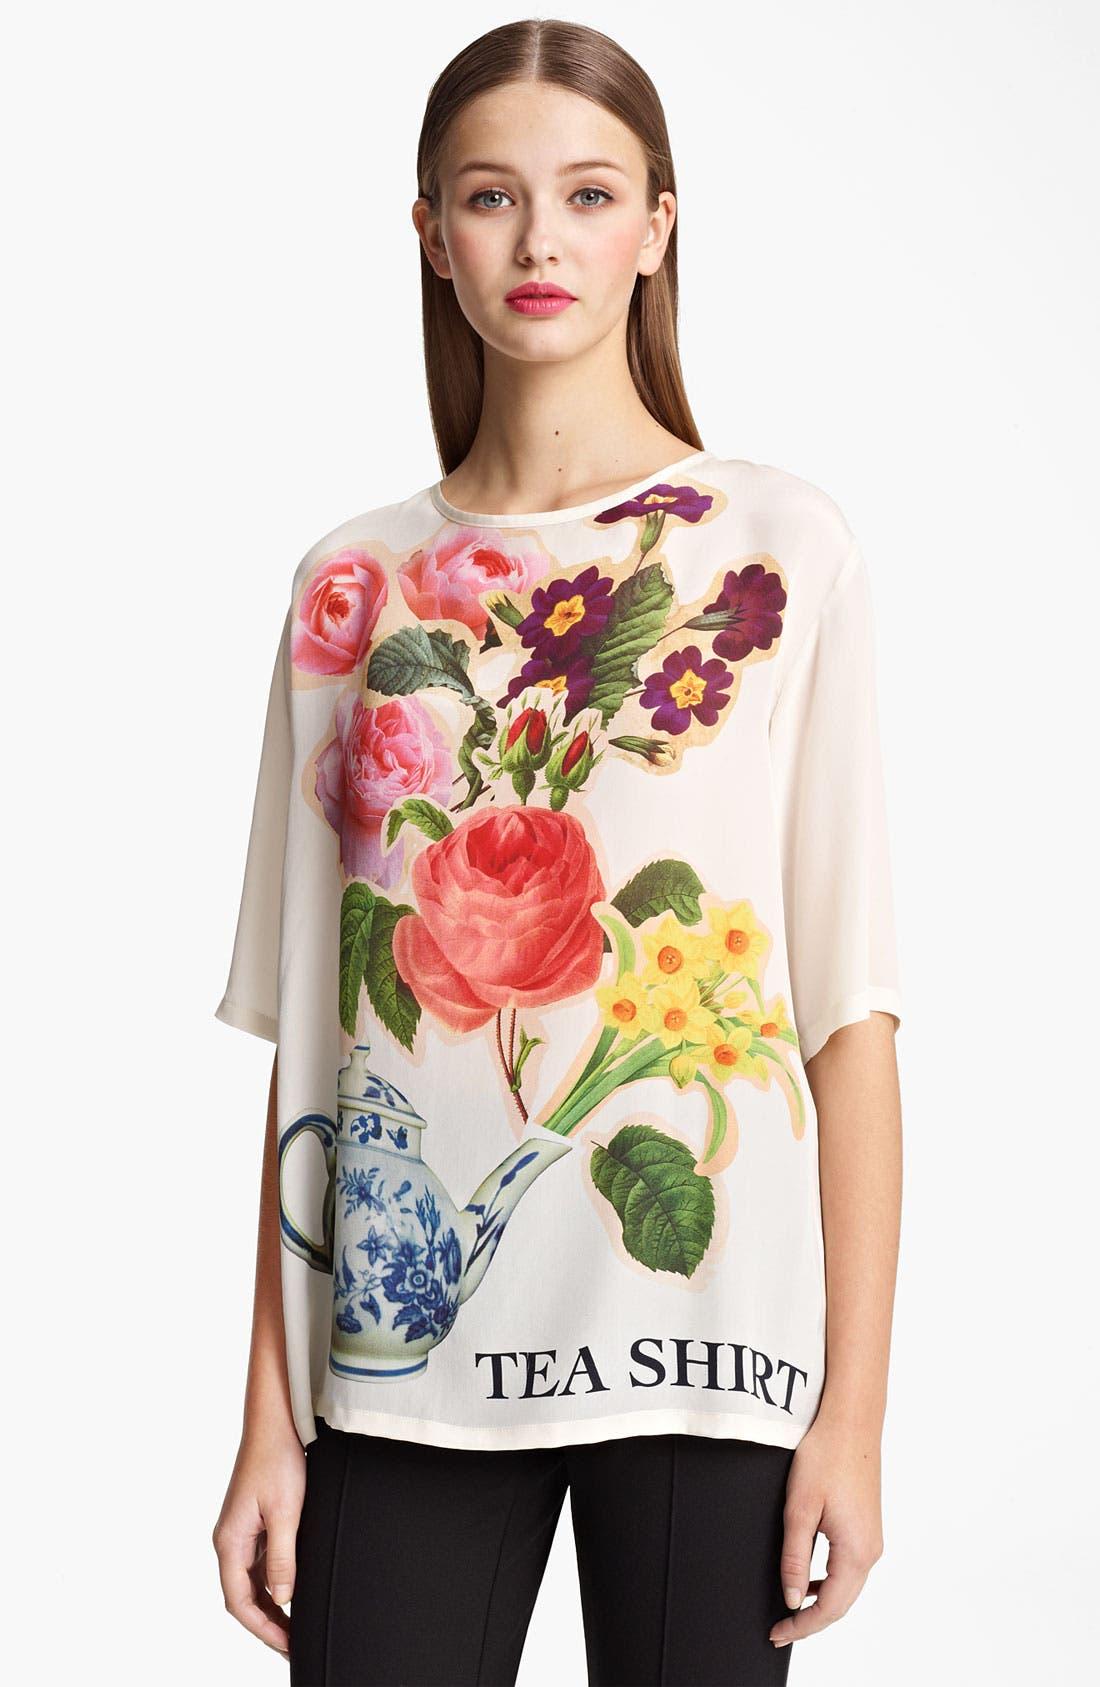 Alternate Image 1 Selected - Moschino Cheap & Chic 'Tea Shirt' Print Silk Tee